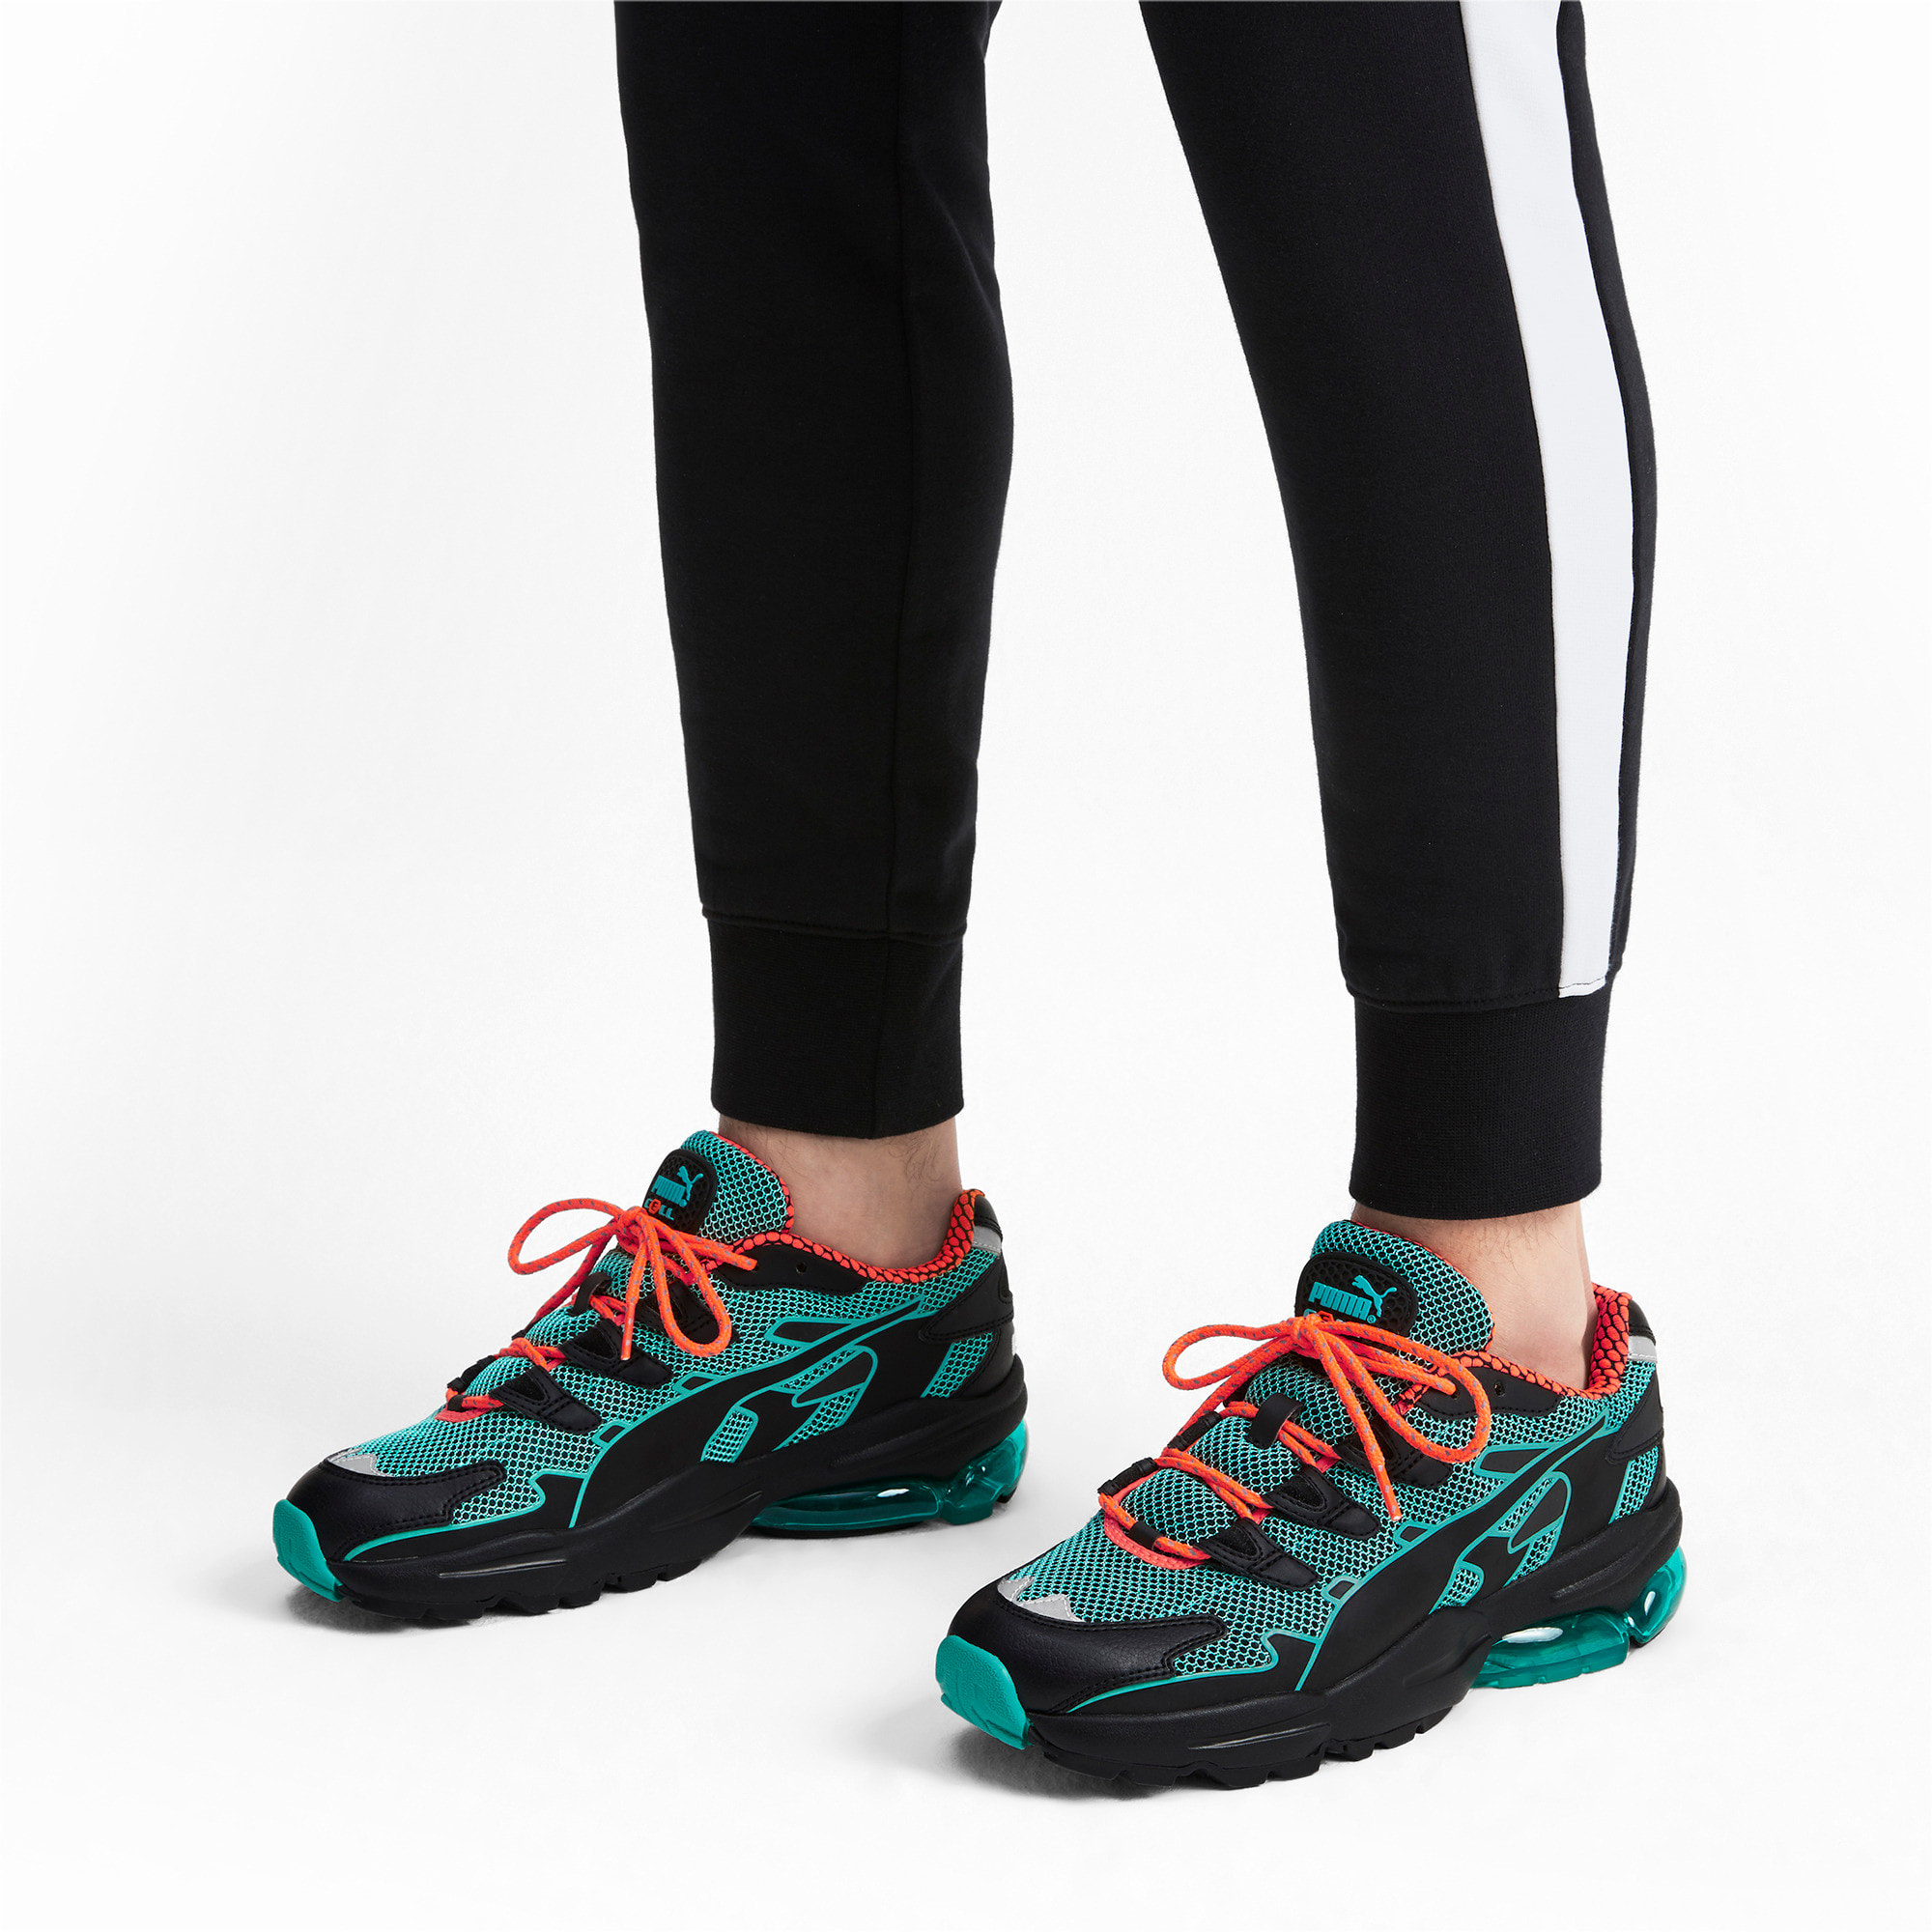 Thumbnail 2 of CELL Alien Kotto Sneakers, Puma Black-Blue Turquoise, medium